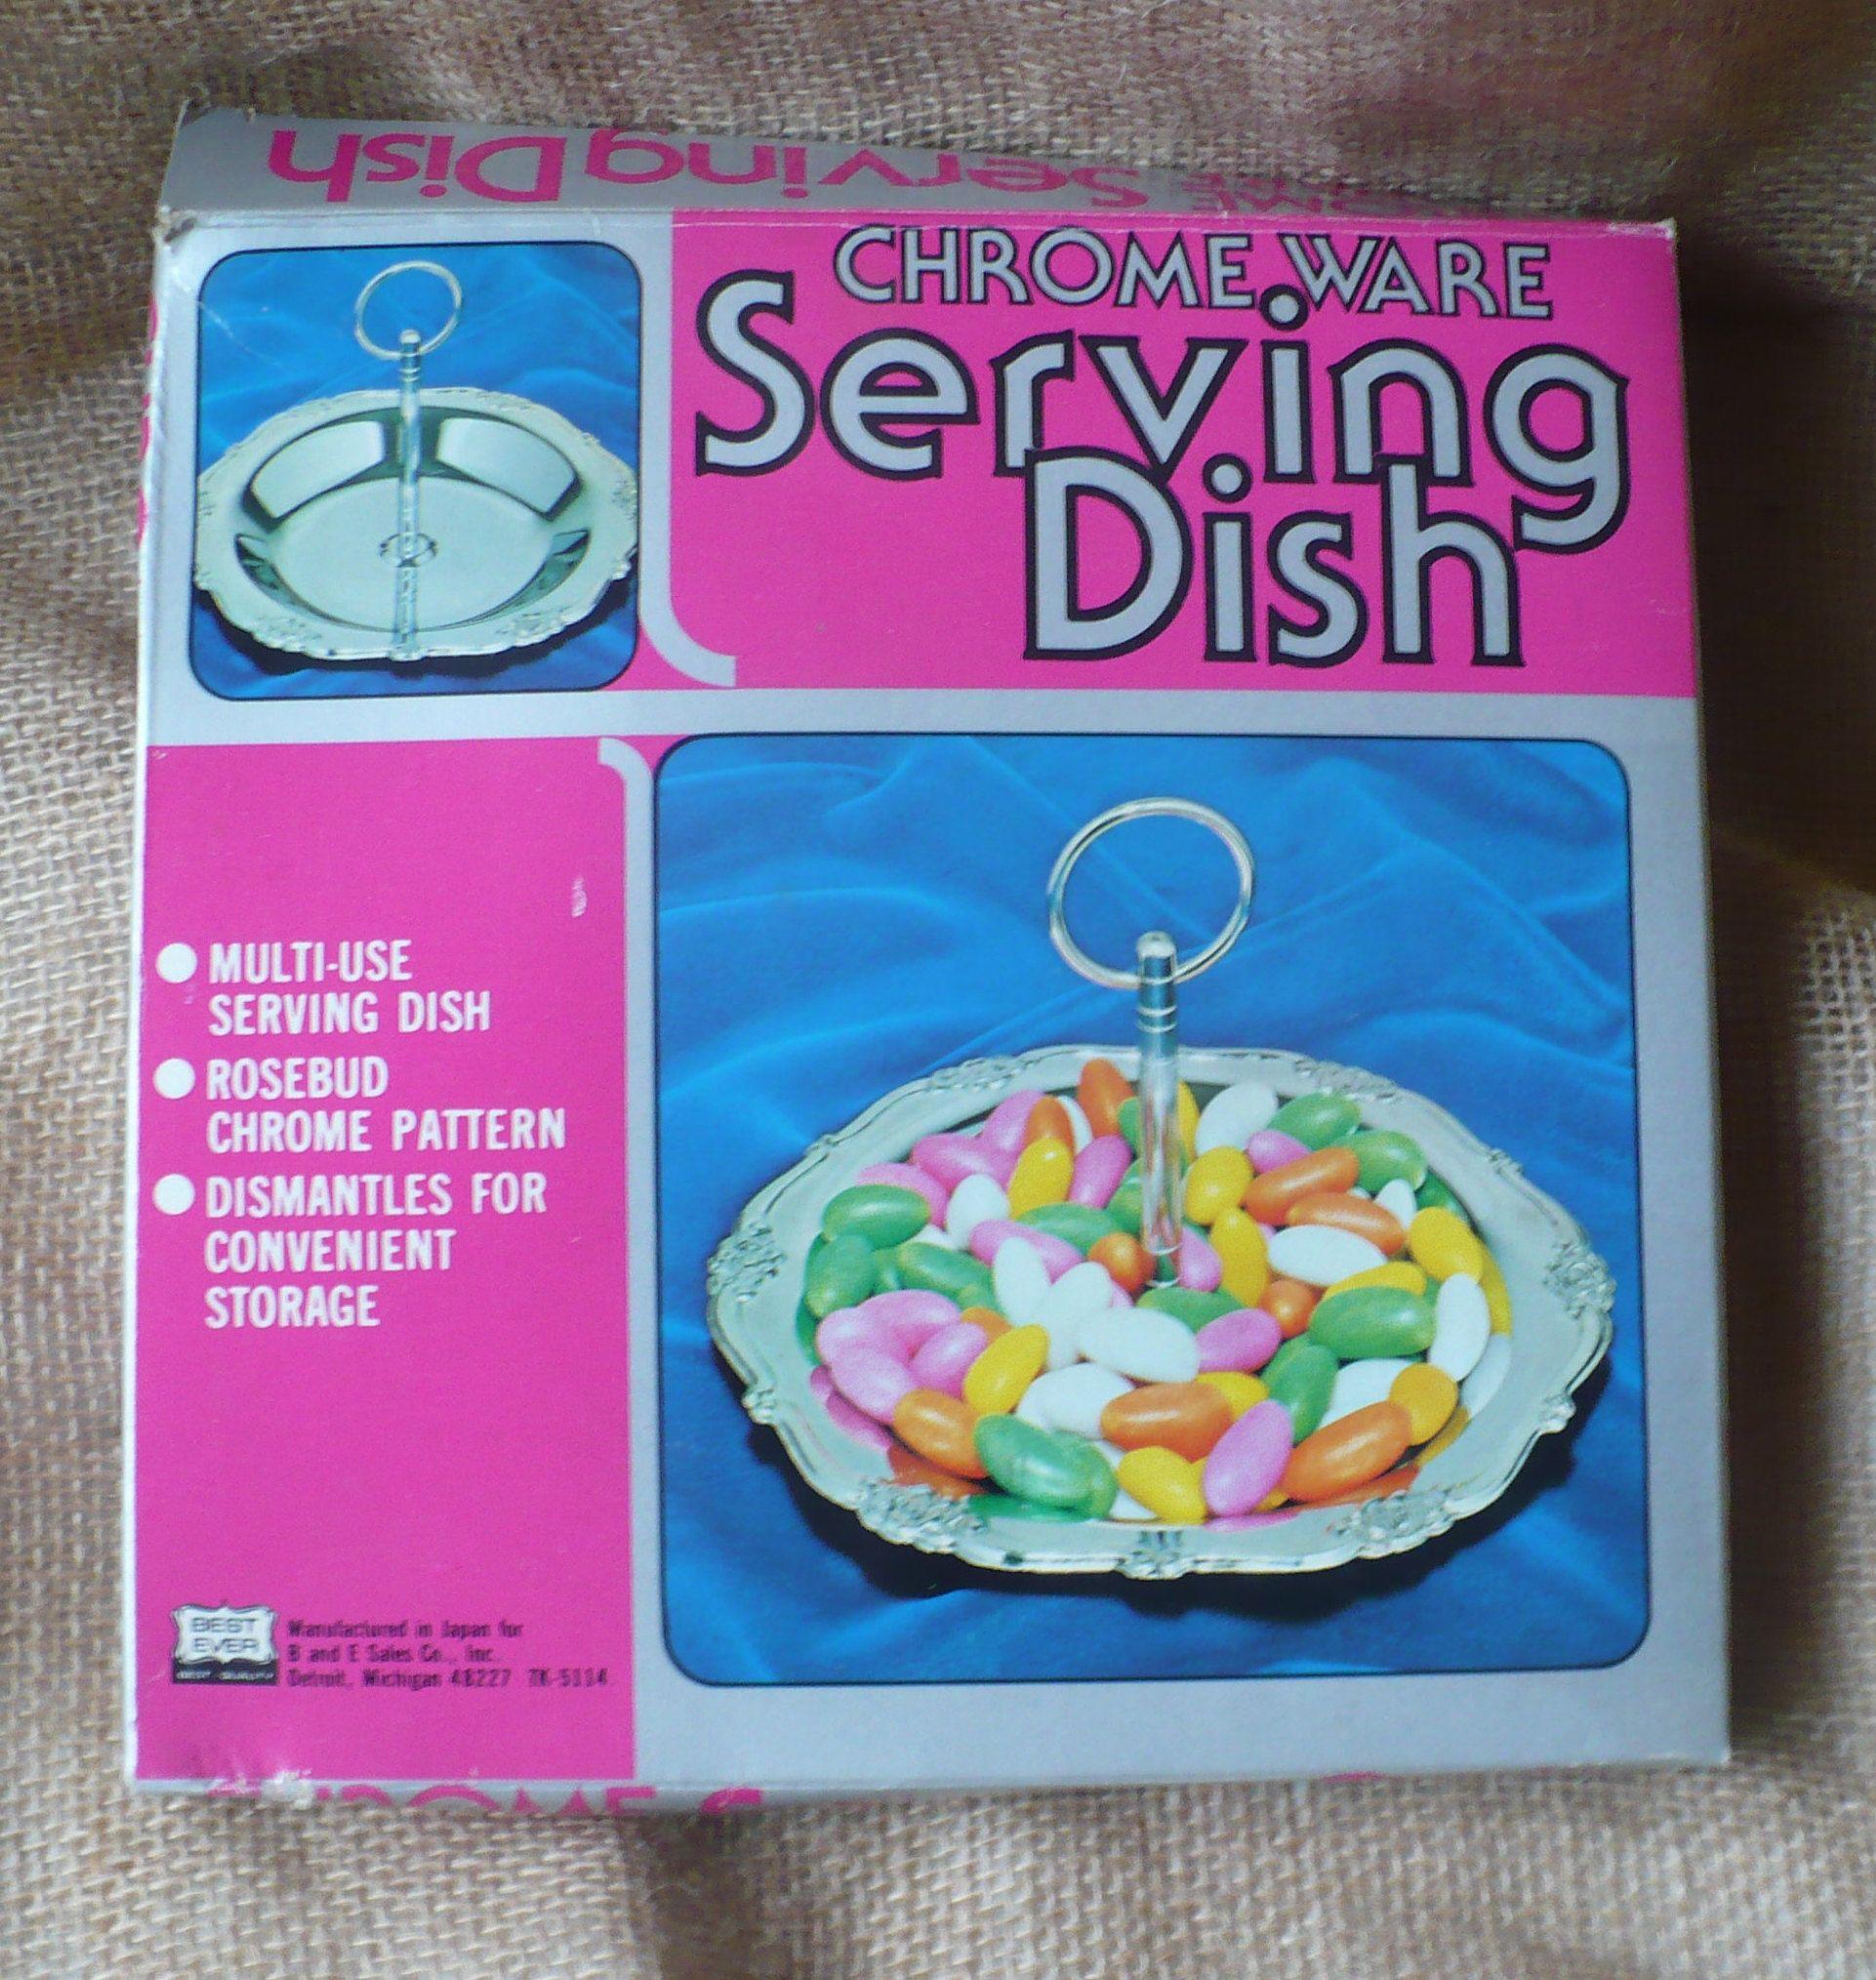 Chrome Ware Serving Dish, Vintage Made in Japan Candy Dish, Vintage Relish Tray, Rosebud Pattern, Free Shipping #dishware